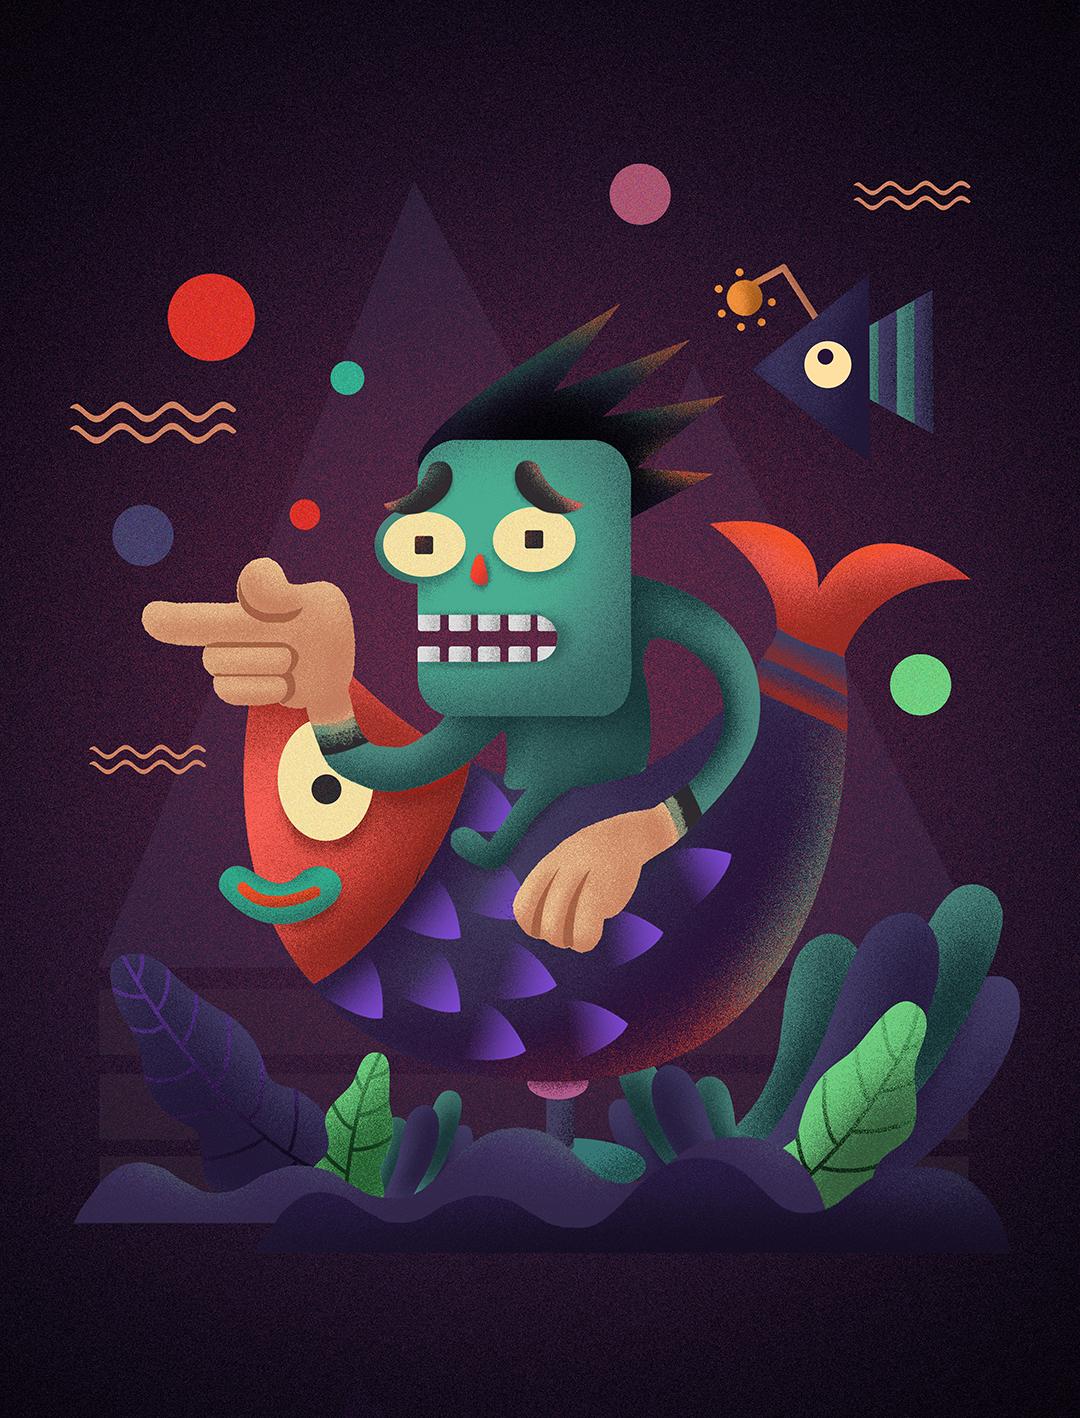 GirlsclubAsia-Illustrator-7Leaf Han-3